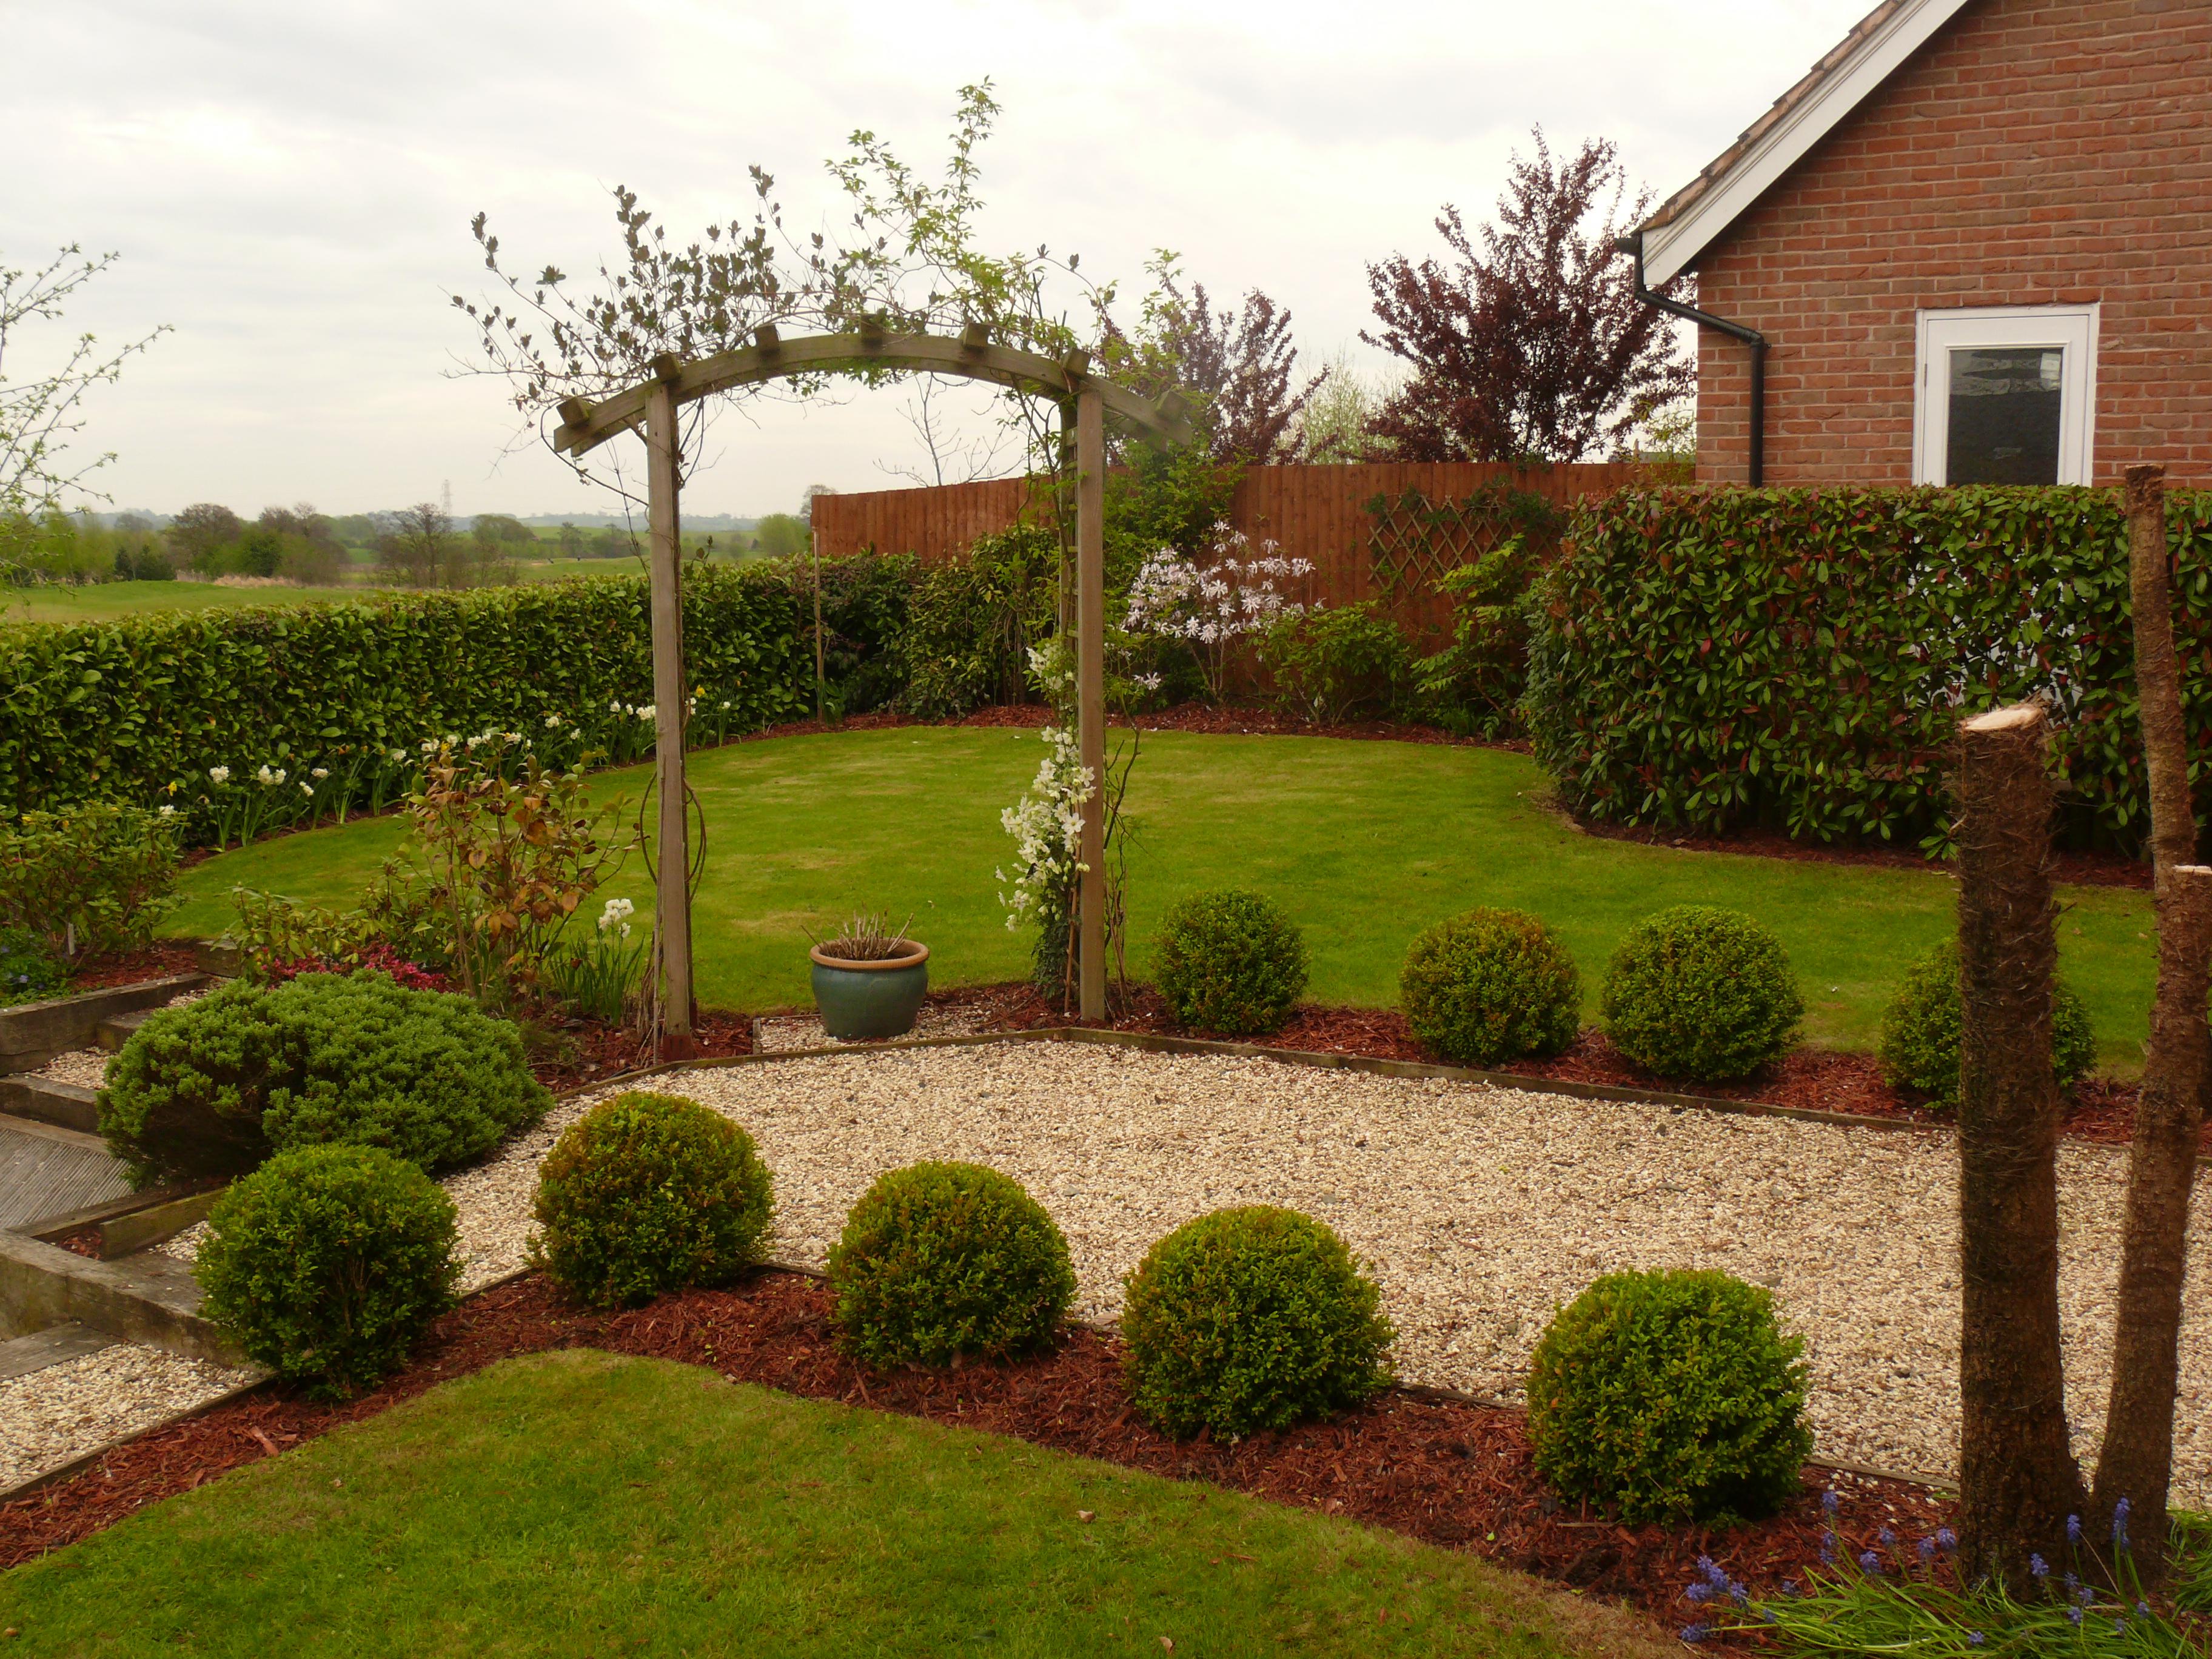 Topiary, Ball, Bark, Border, Gravel, Edging, Lawn Mowing, Wychwood Park Jones 3